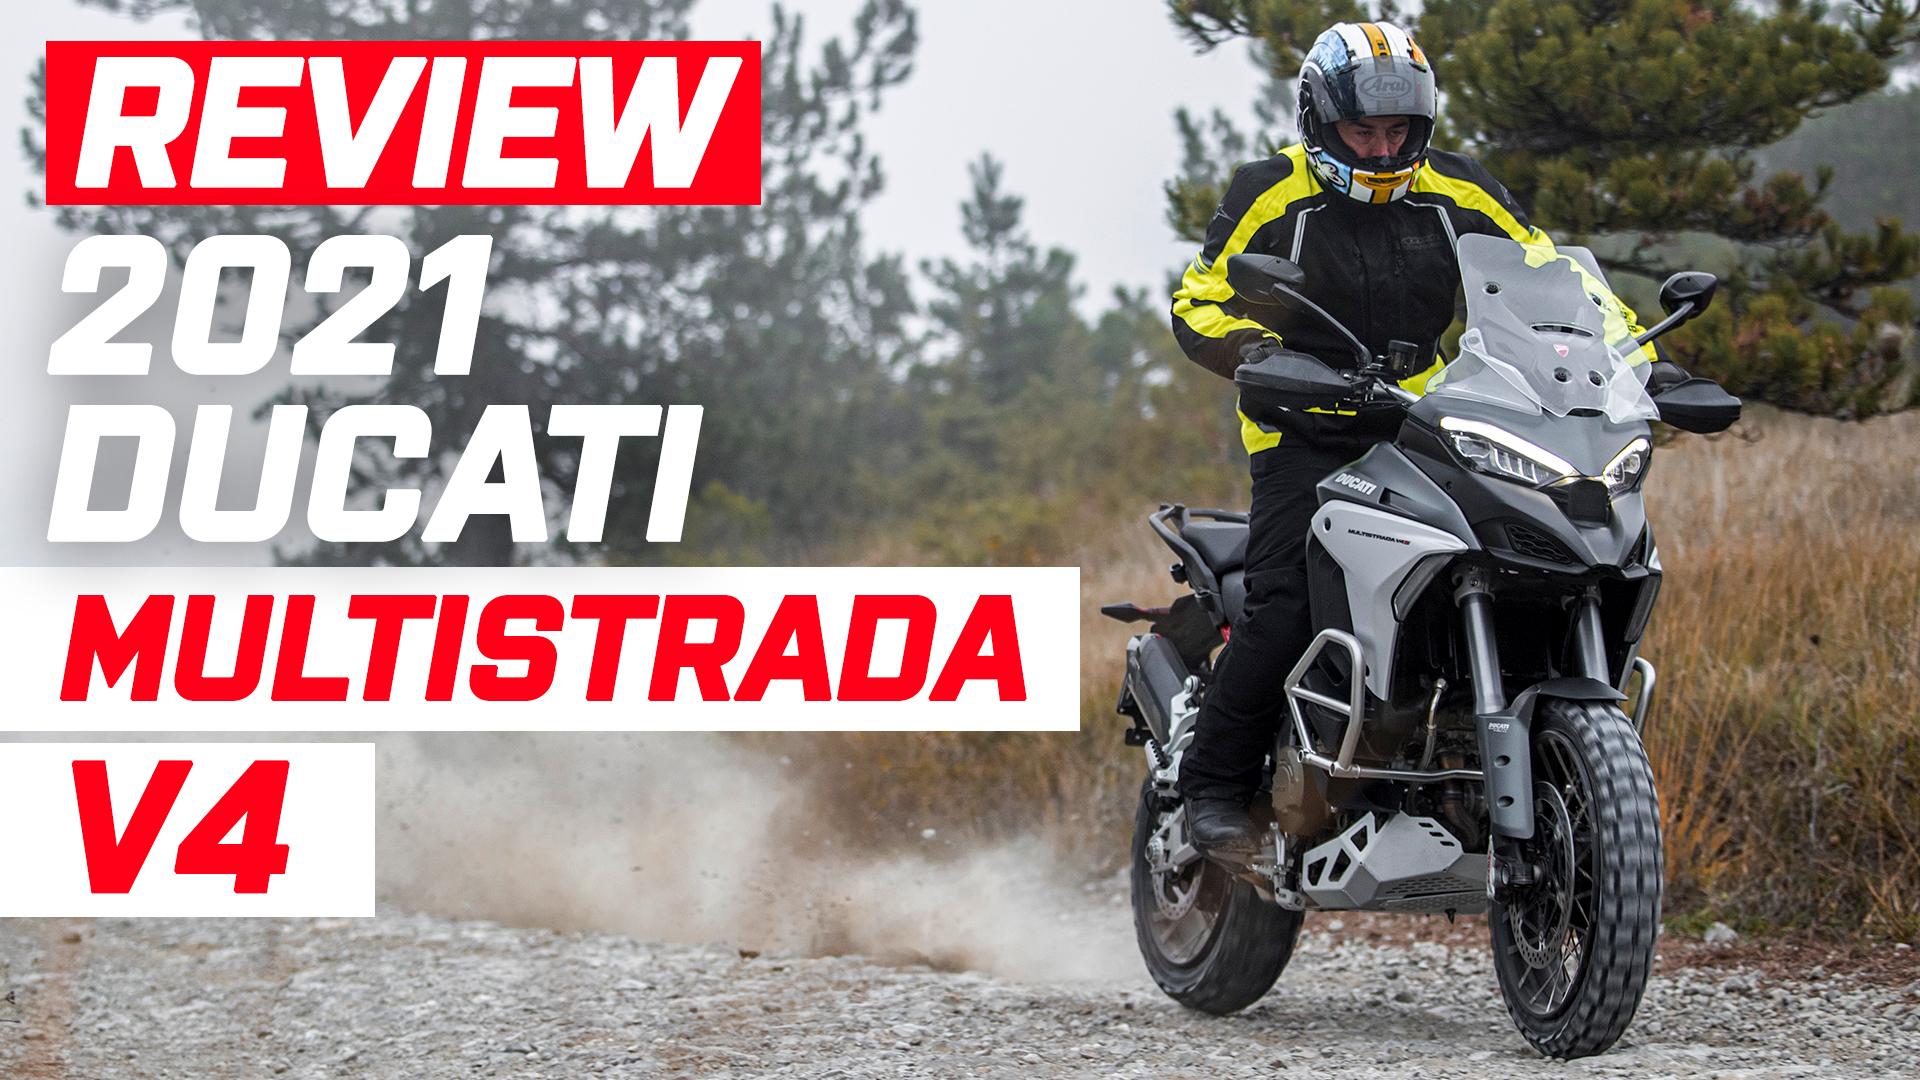 Ducati Multistrada V4 Thumbnail.jpg